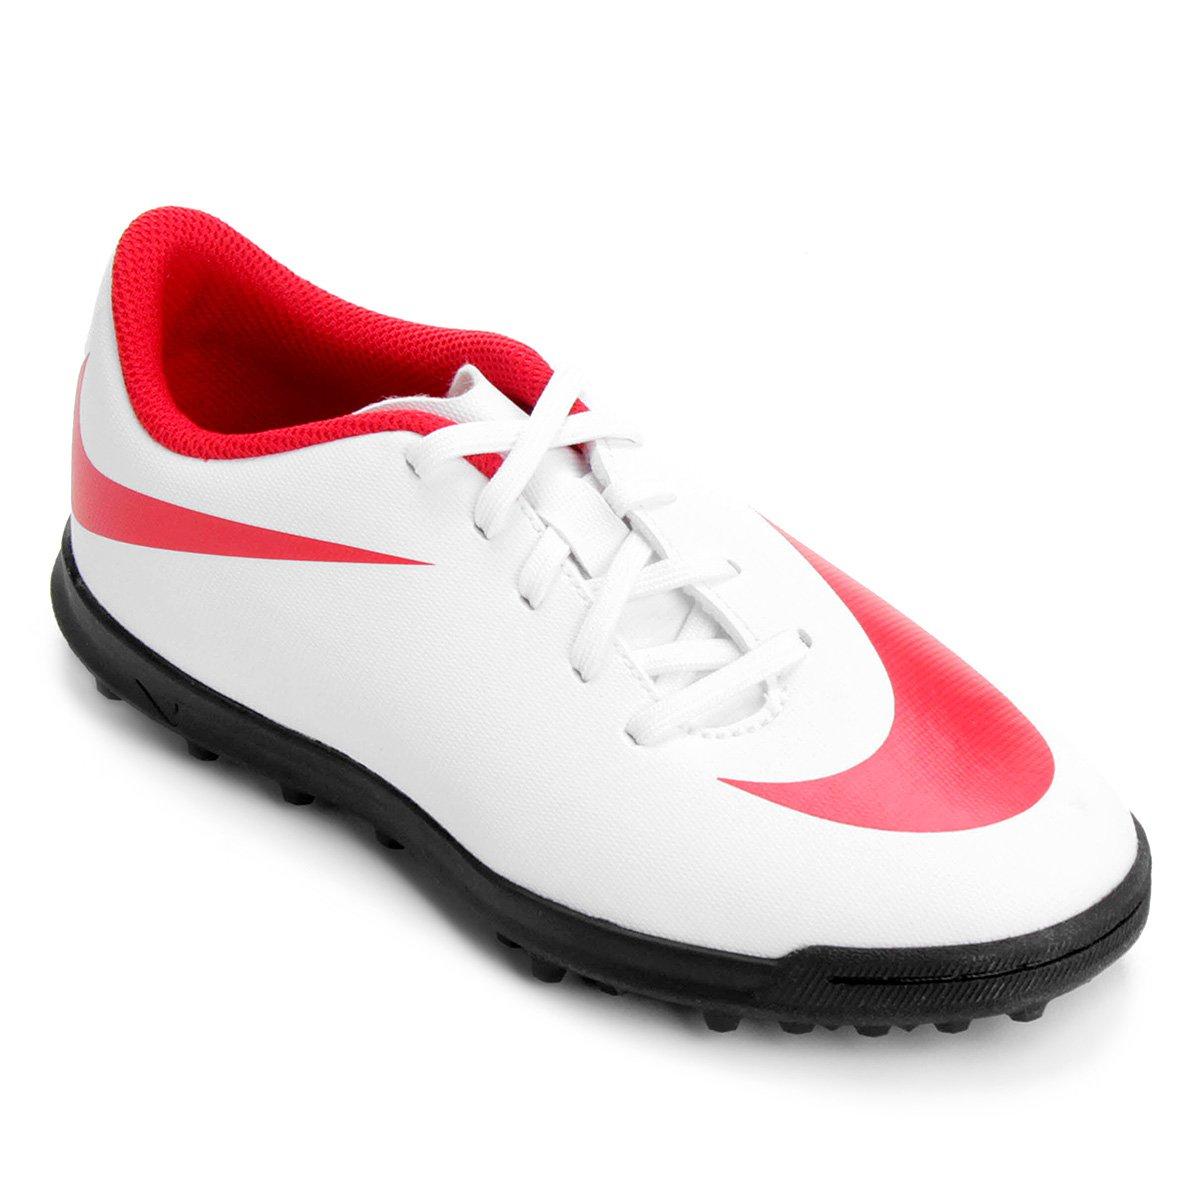 ef9b480d1058f Chuteira Society Infantil Nike Bravata 2 TF - Branco e Vermelho - Compre  Agora